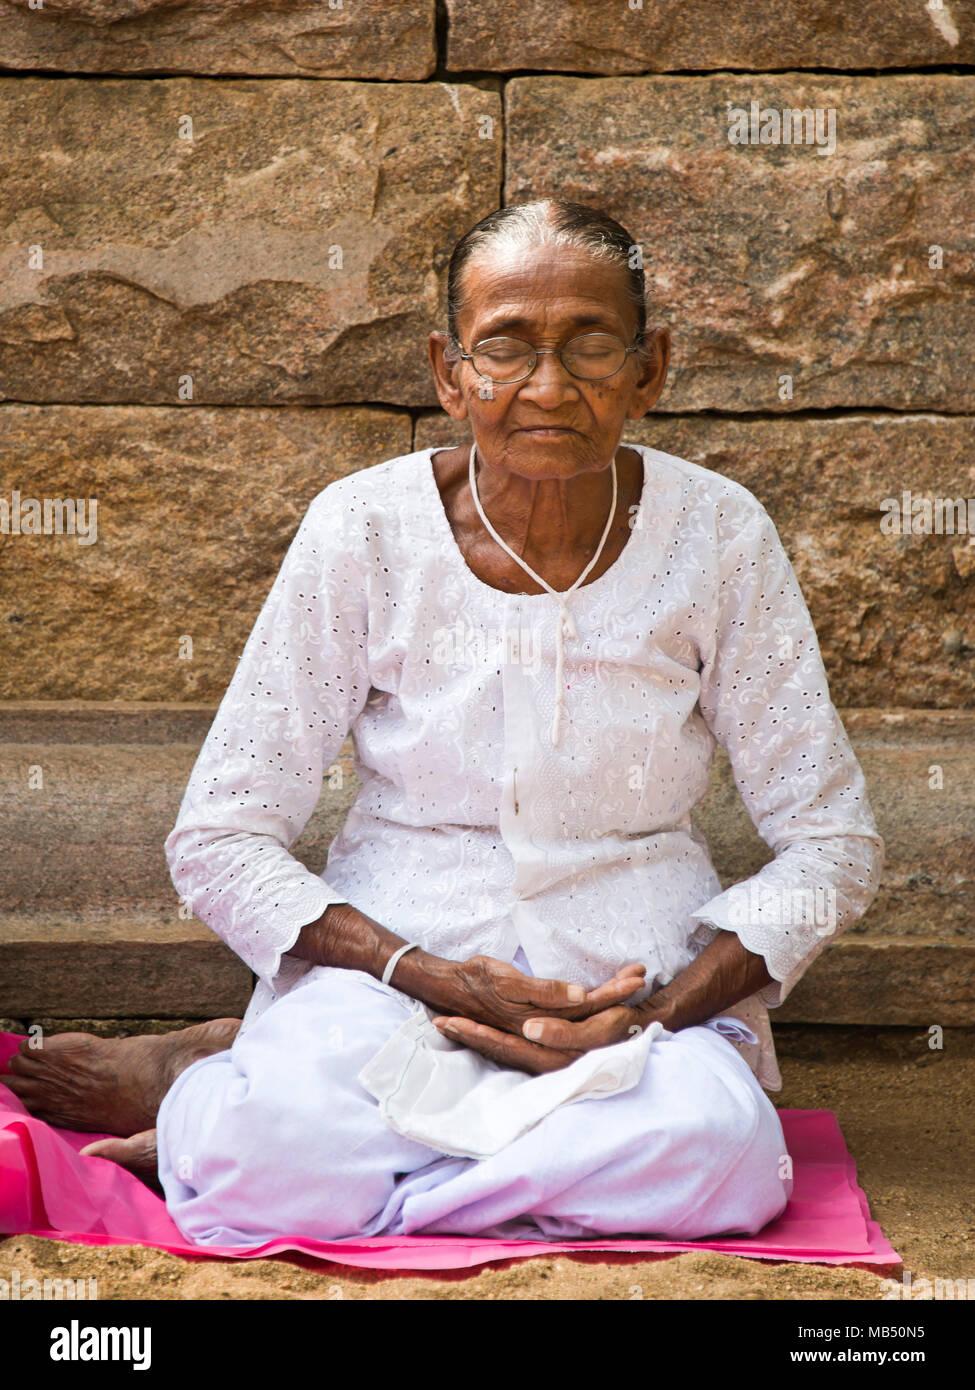 Vertical portrait of an old lady meditating at Jaya Sri Maha Bodhi in Anuradhapura, Sri Lanka. Stock Photo